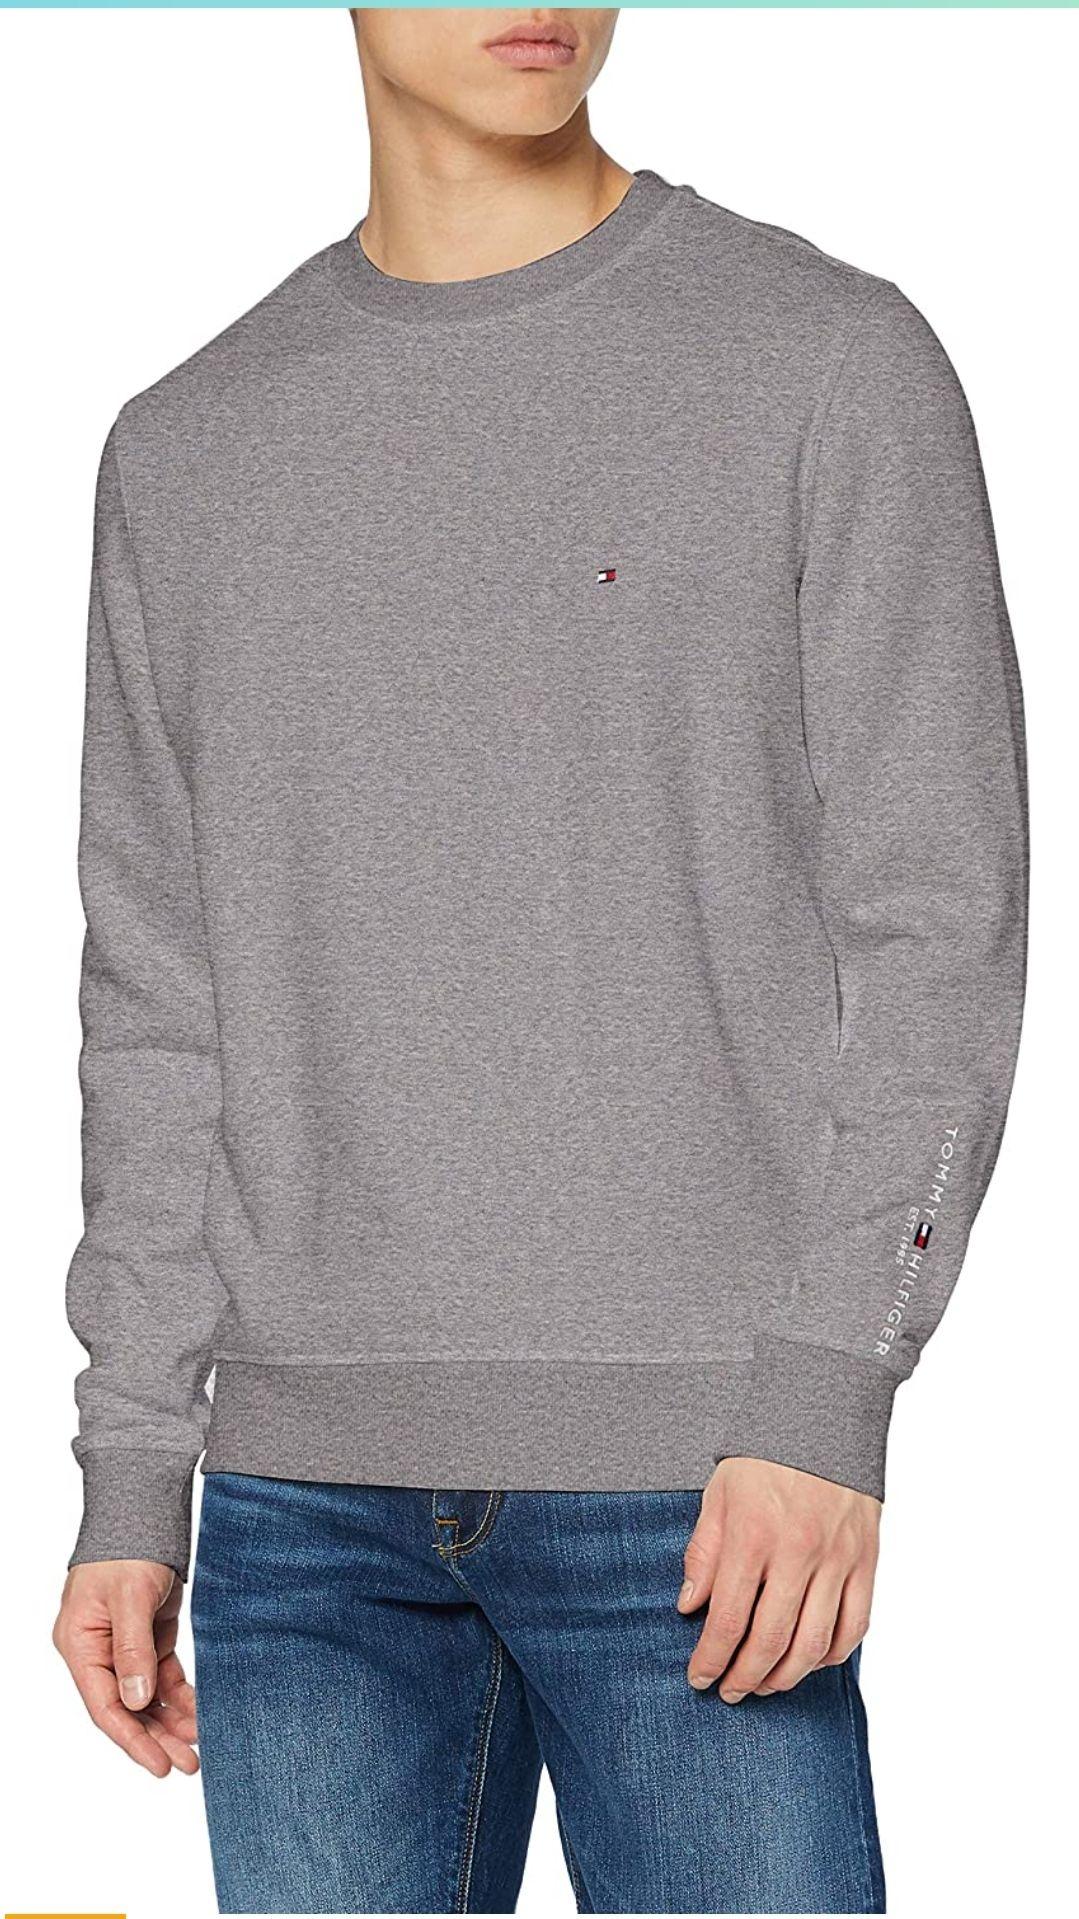 Sweat-shirt Tommy Hilfiger homme - XS ou XL